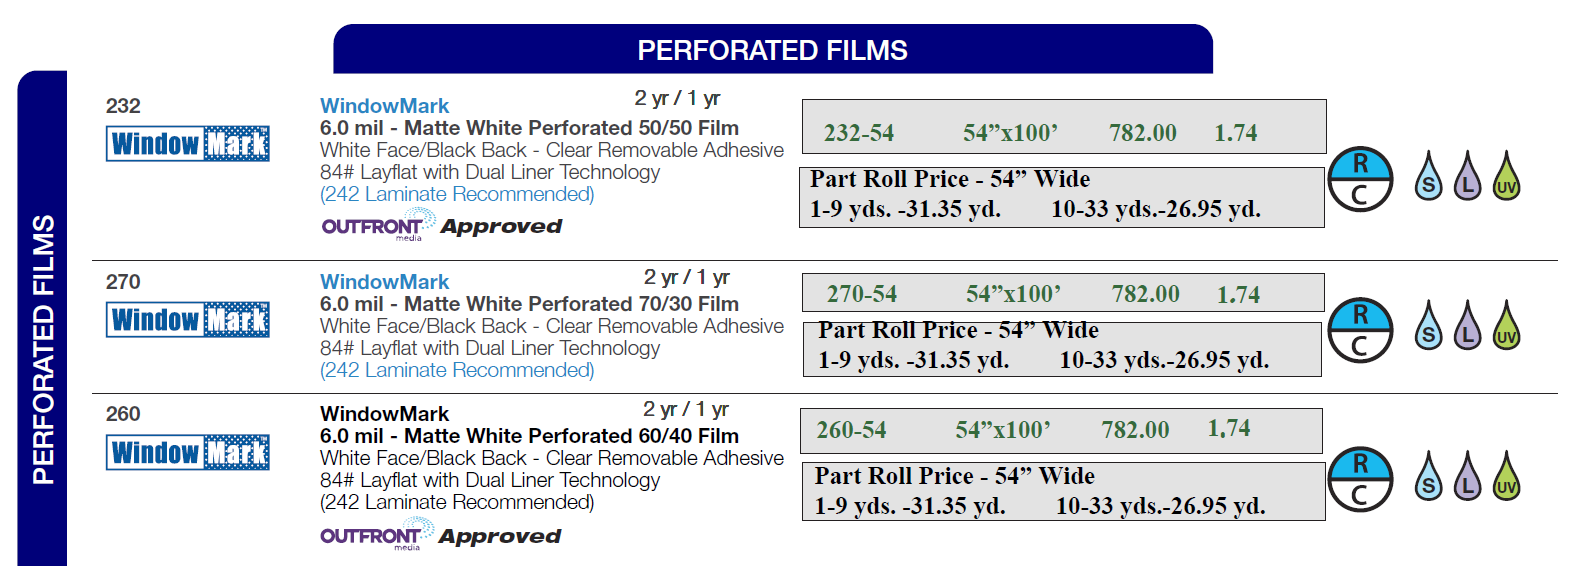 perf film 1 - Digital Print Media - Window Perf